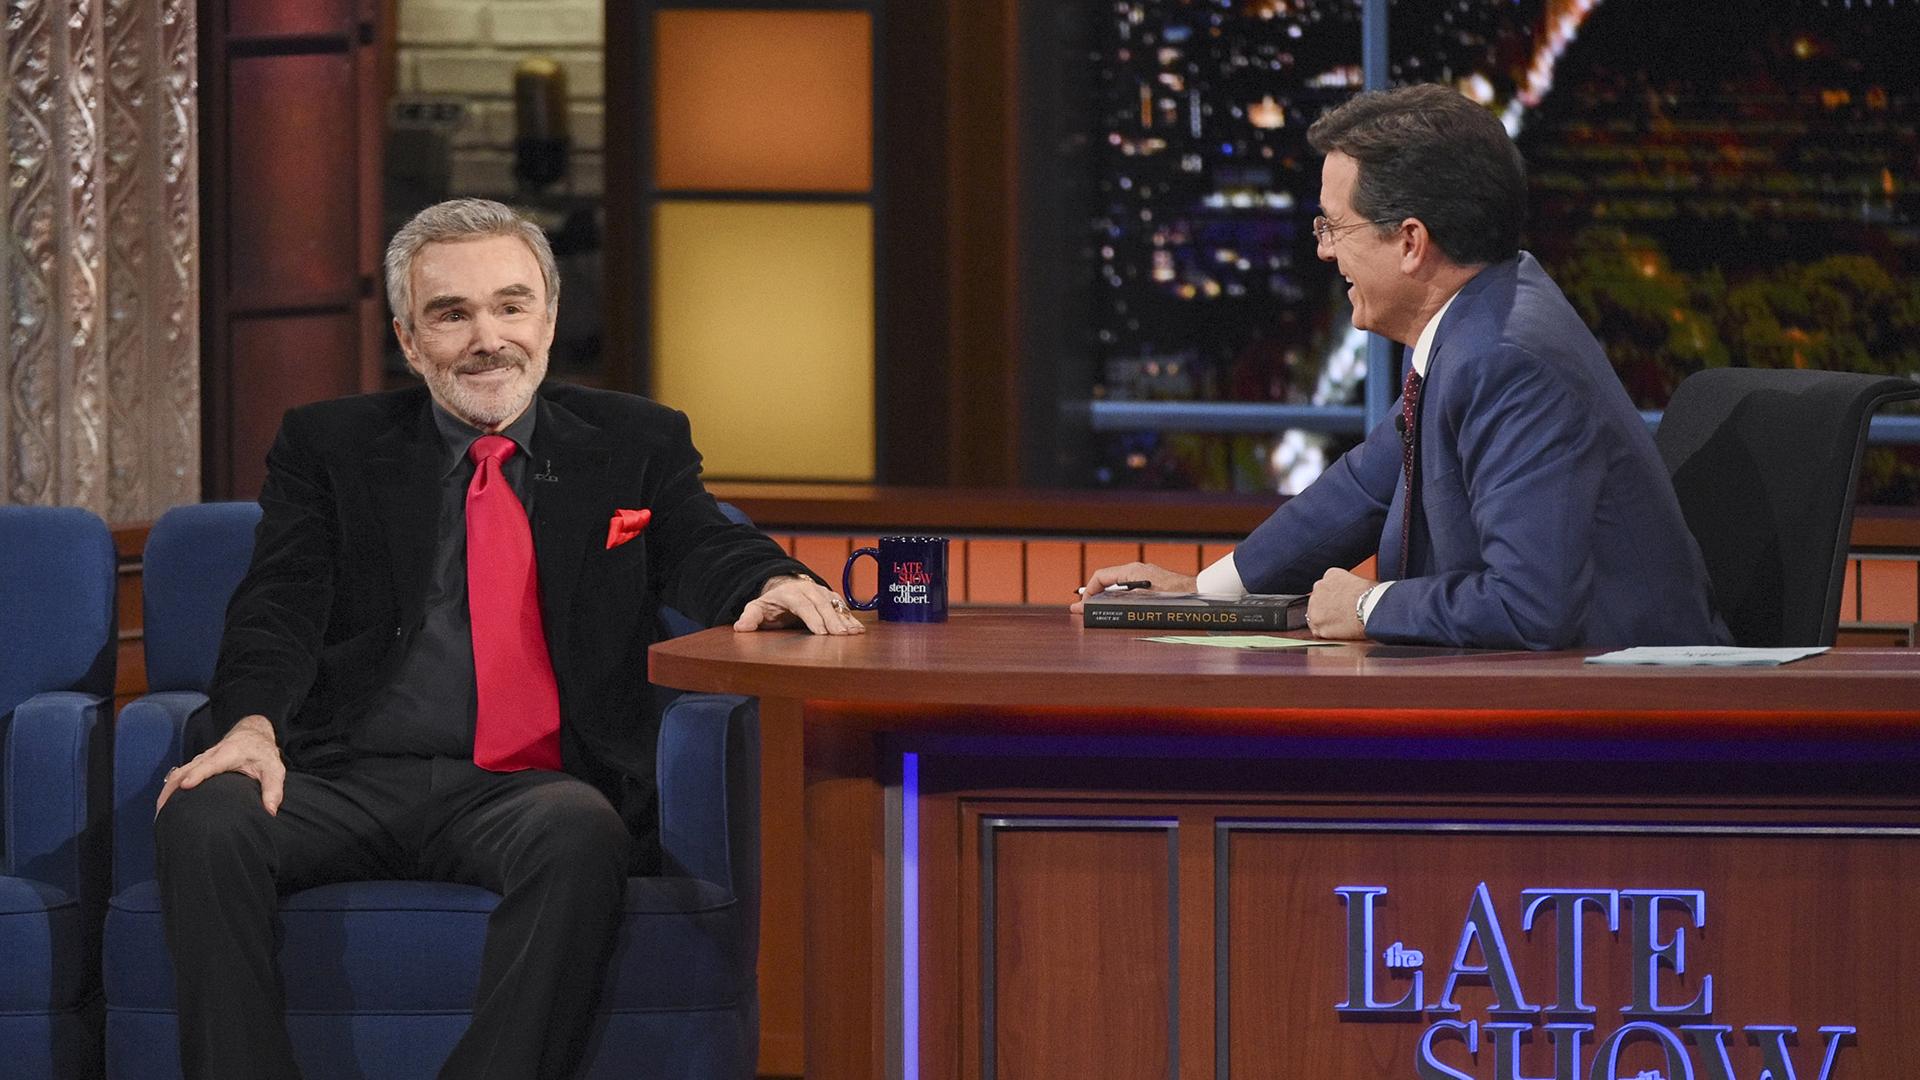 Burt Reynolds and Stephen Colbert